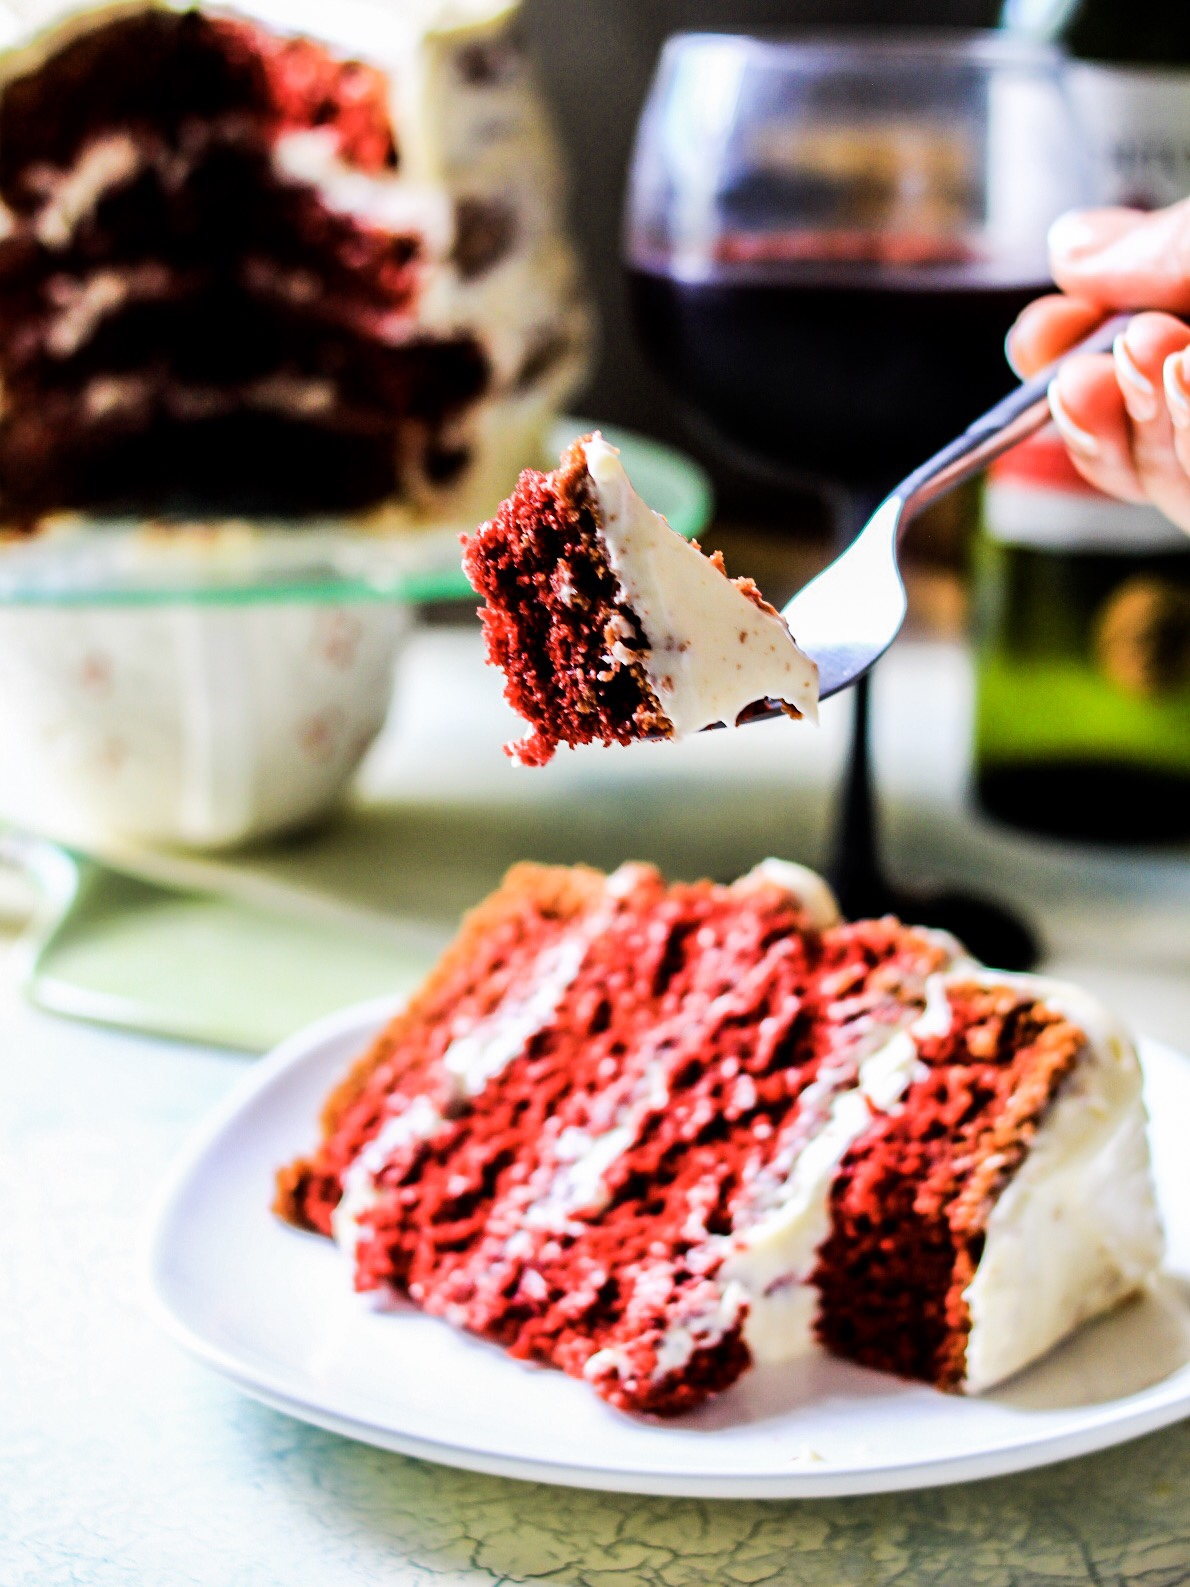 Red Velvet cake with wine